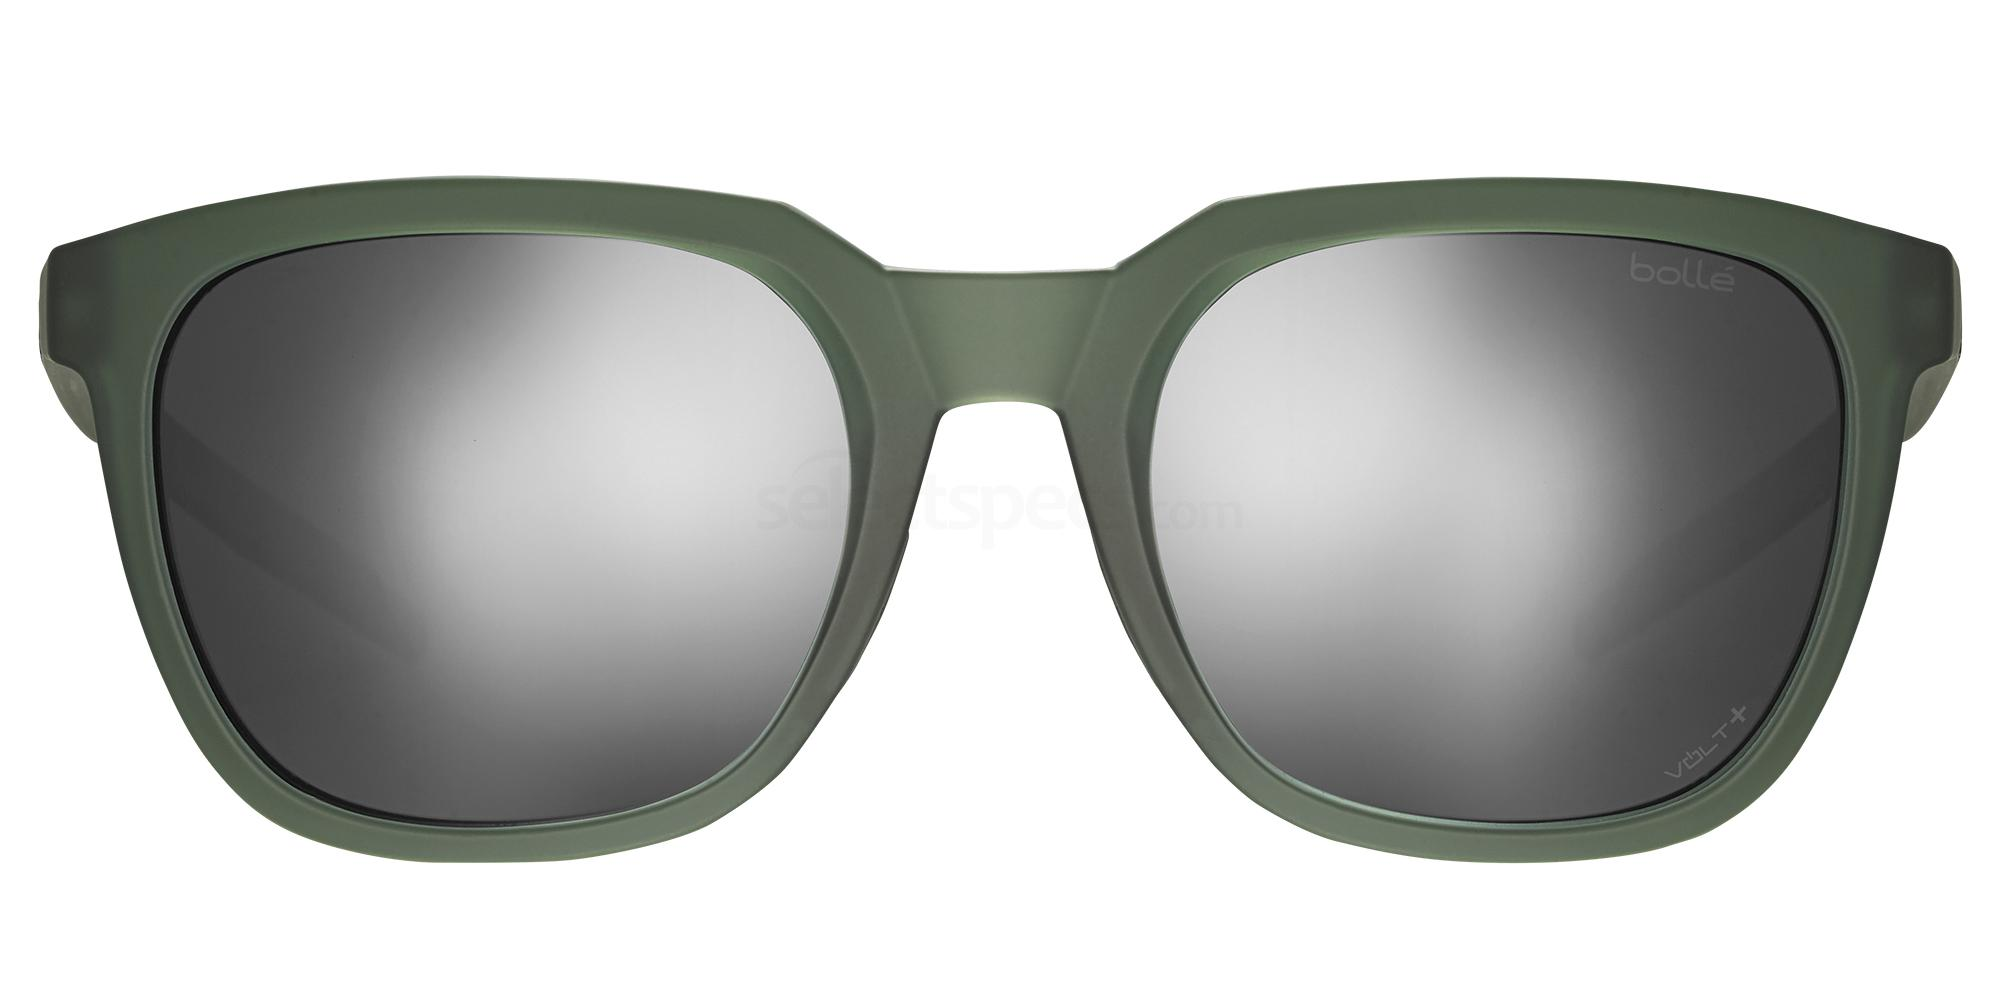 BS017001 TALENT Polarized Sunglasses, Bolle